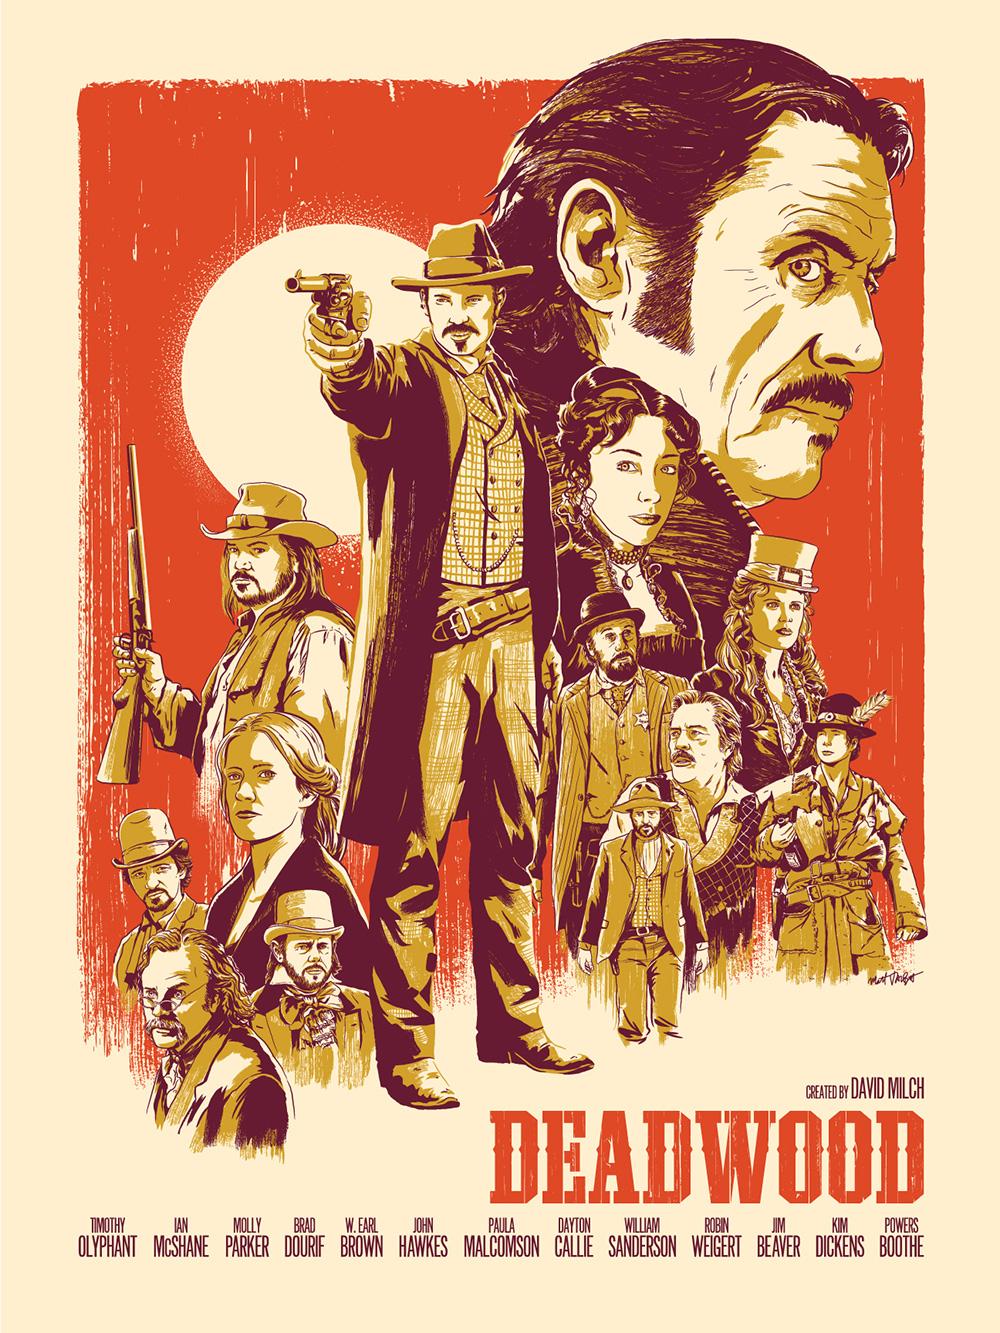 Deadwood print by Matt Talbot for Gallery 1988